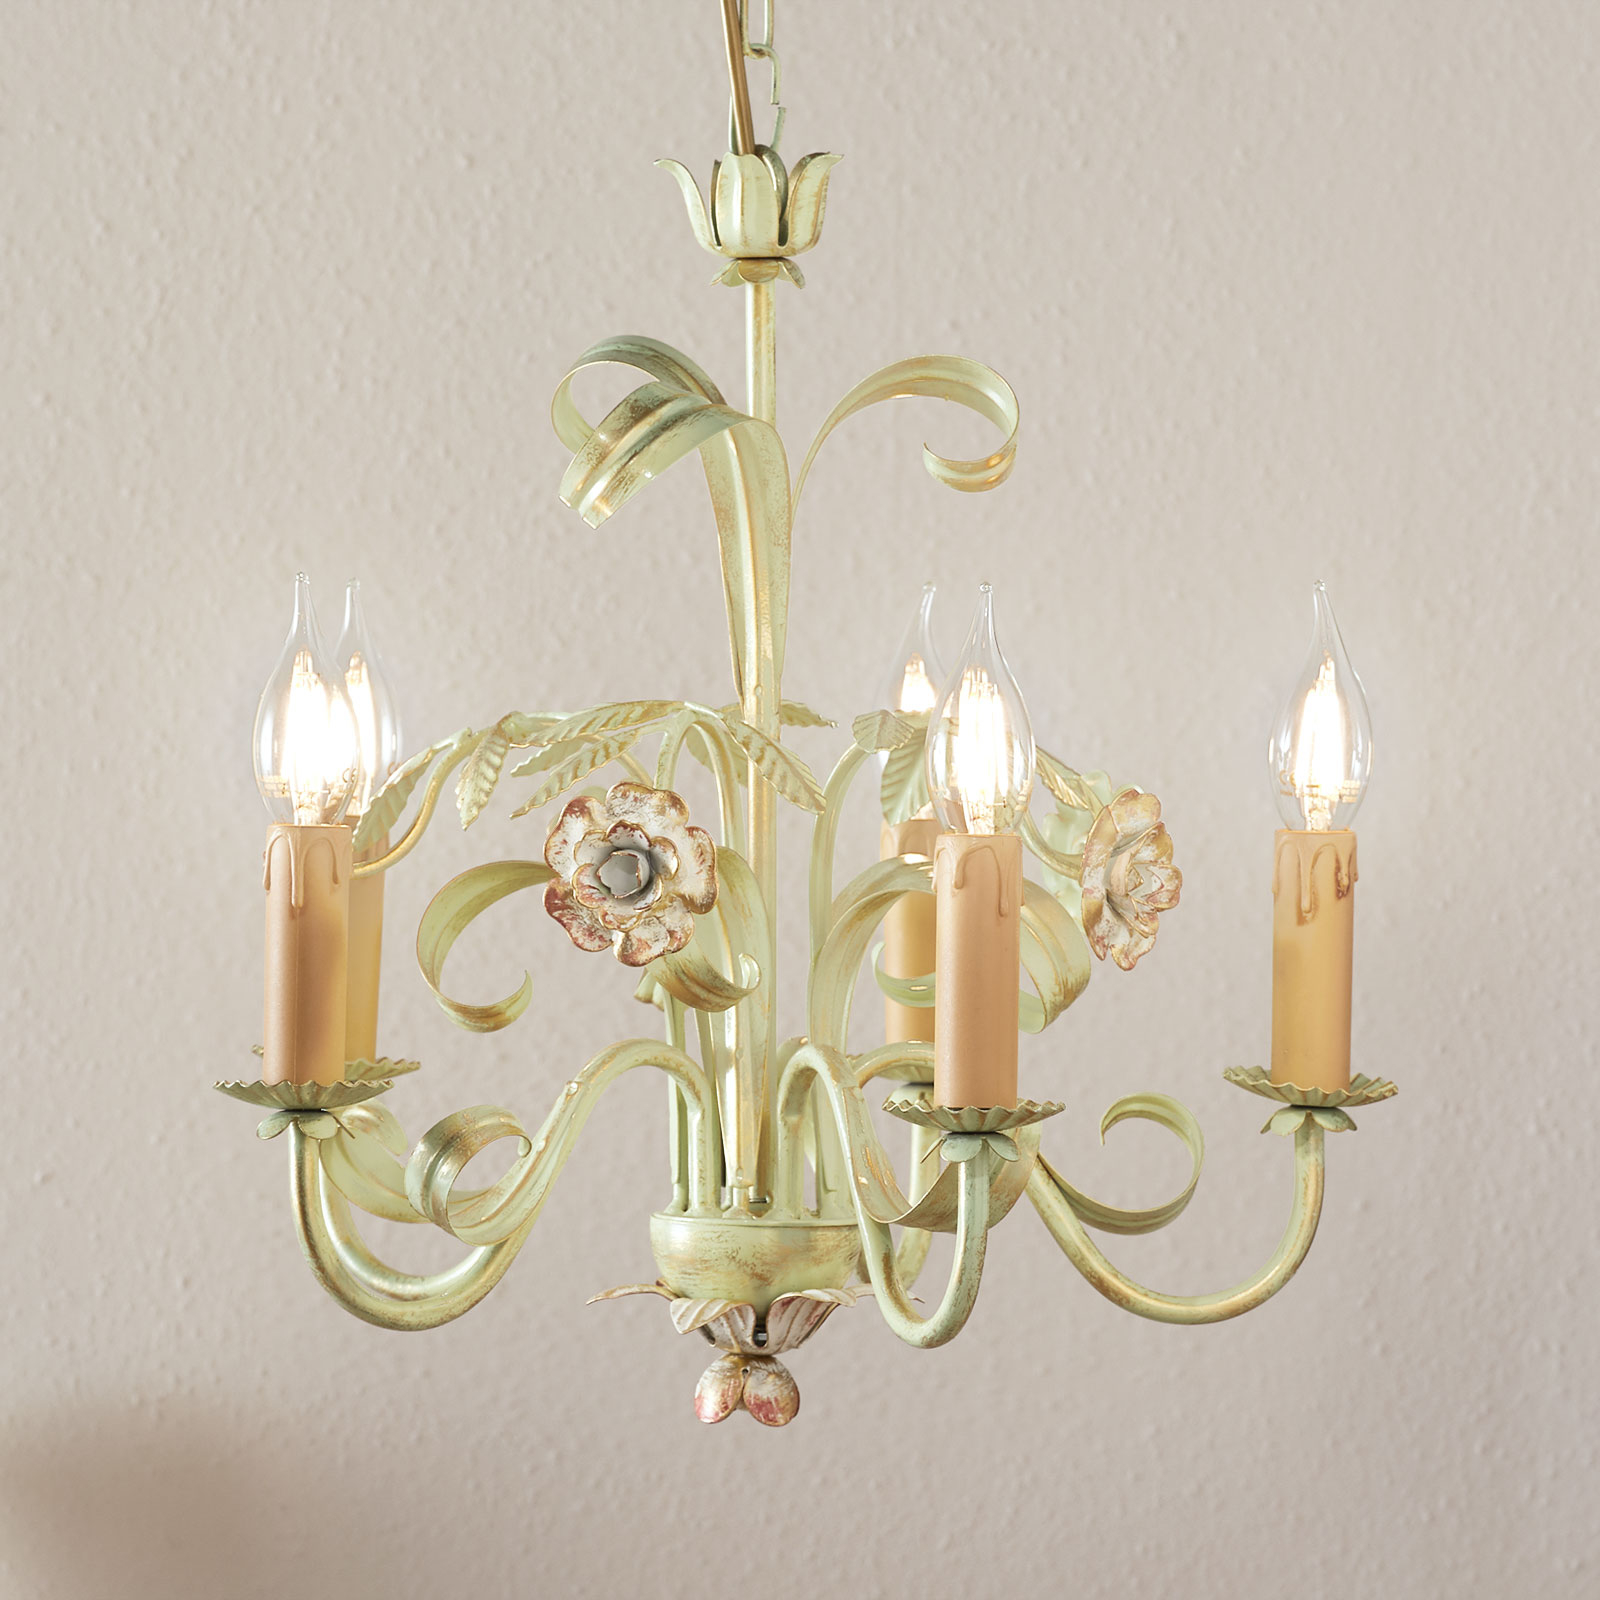 Ljuskrona Tulipe i florentinsk stil, 5 lampor